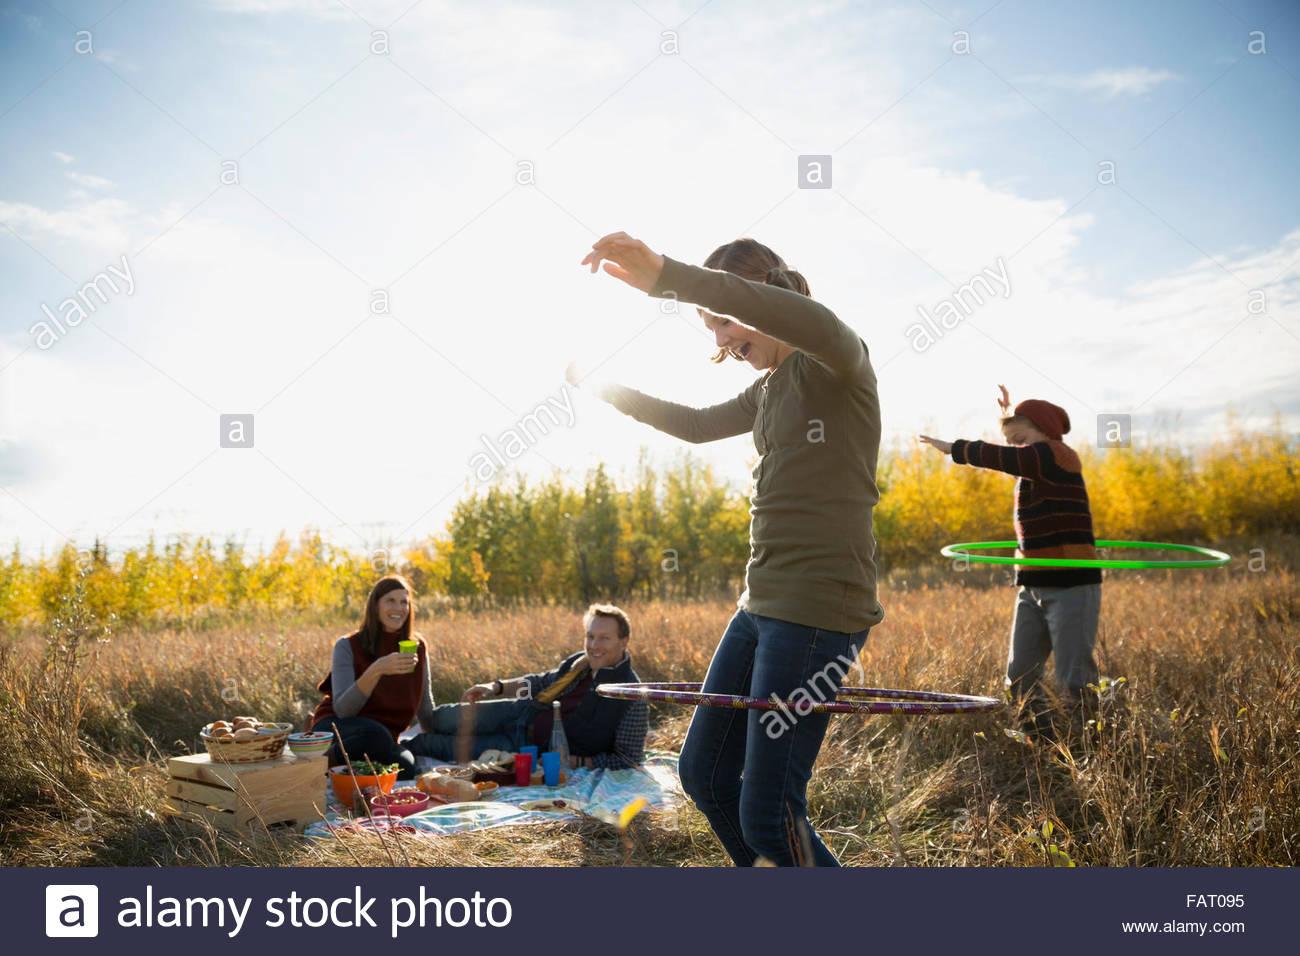 Family enjoying picnic spinning in plastic hoops - Stock Image